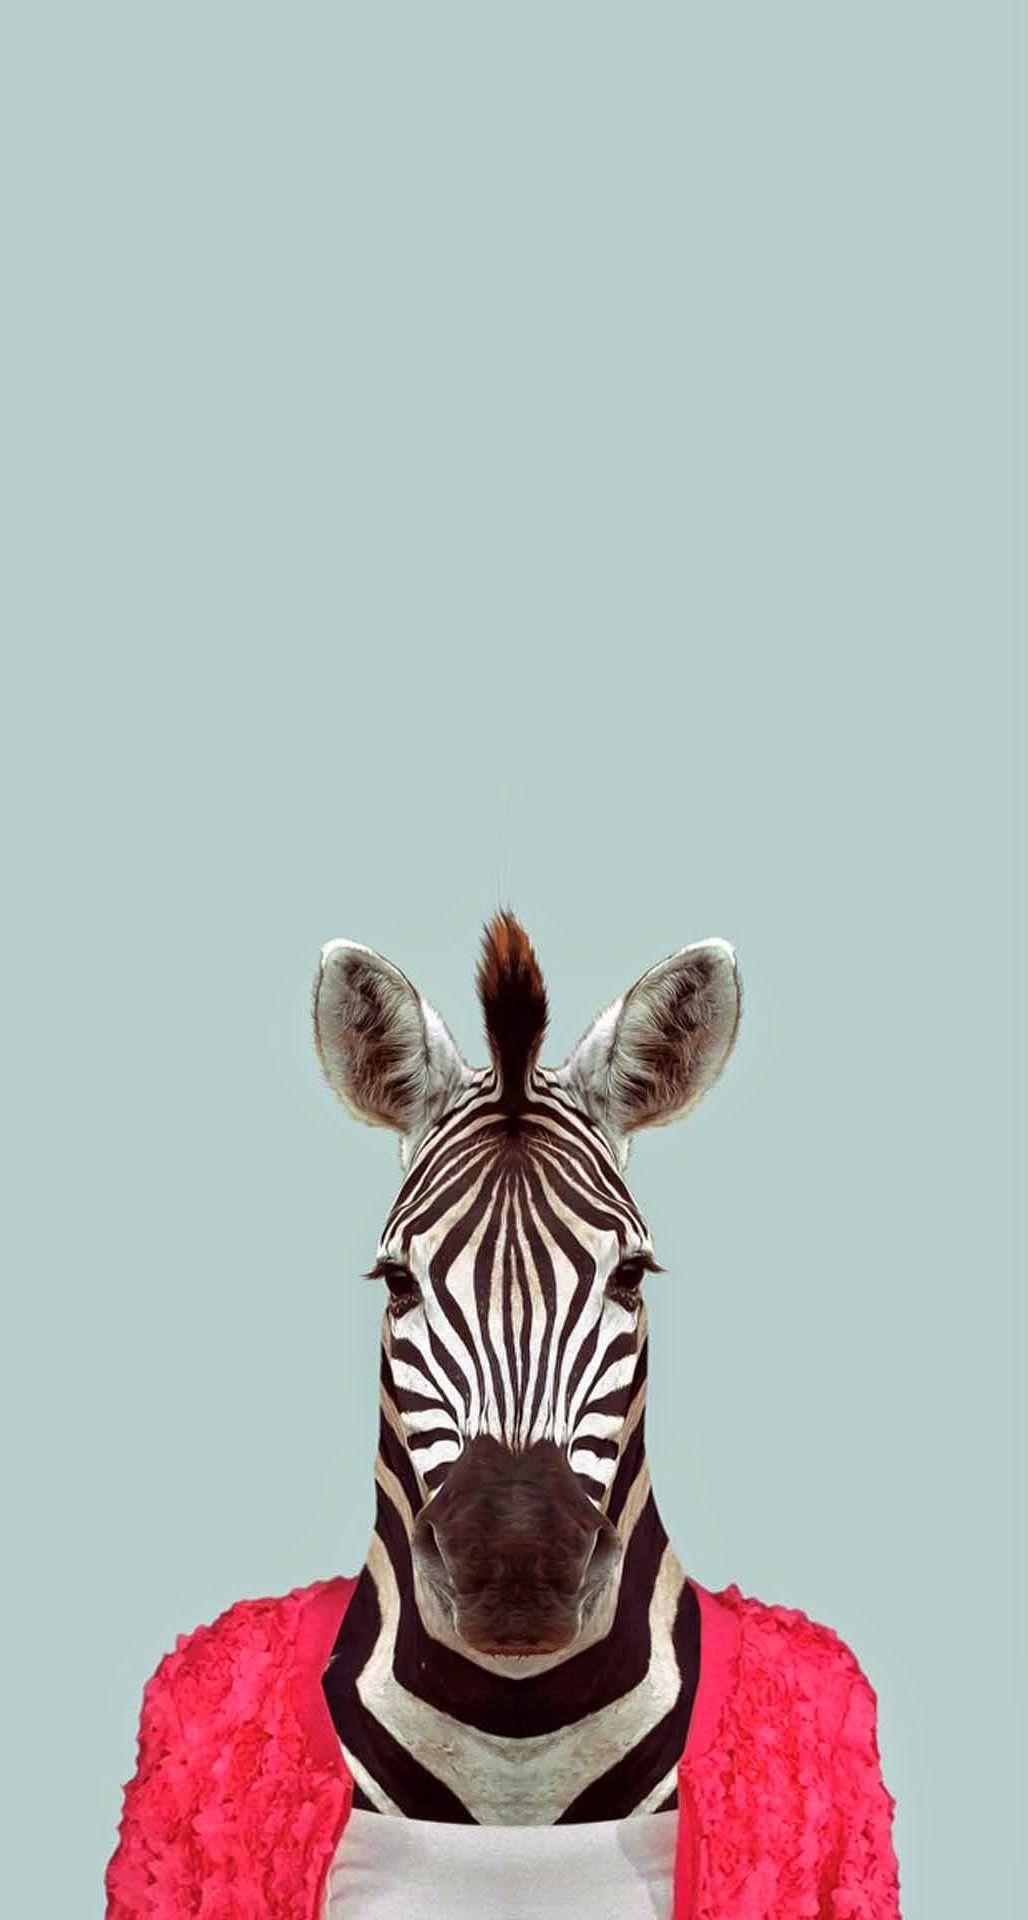 Zebra Funny Animal Portrait Iphone 6 Plus Hd Wallpaper Pet Portraits Animal Wallpaper Zebras